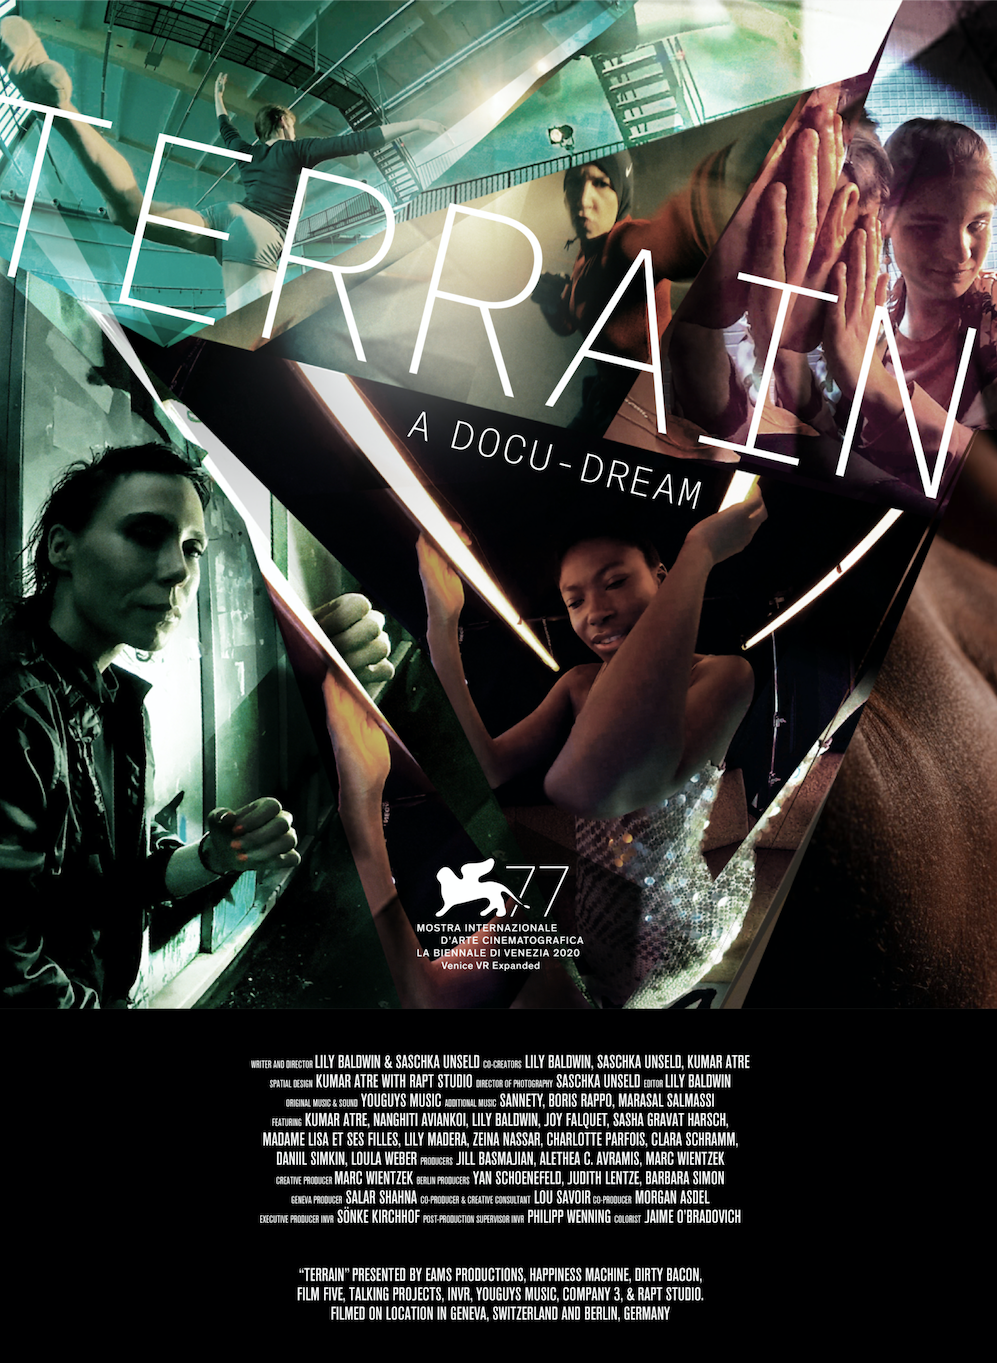 Terrain has its world premiere at Venice Biennale's Venice Film Festival.